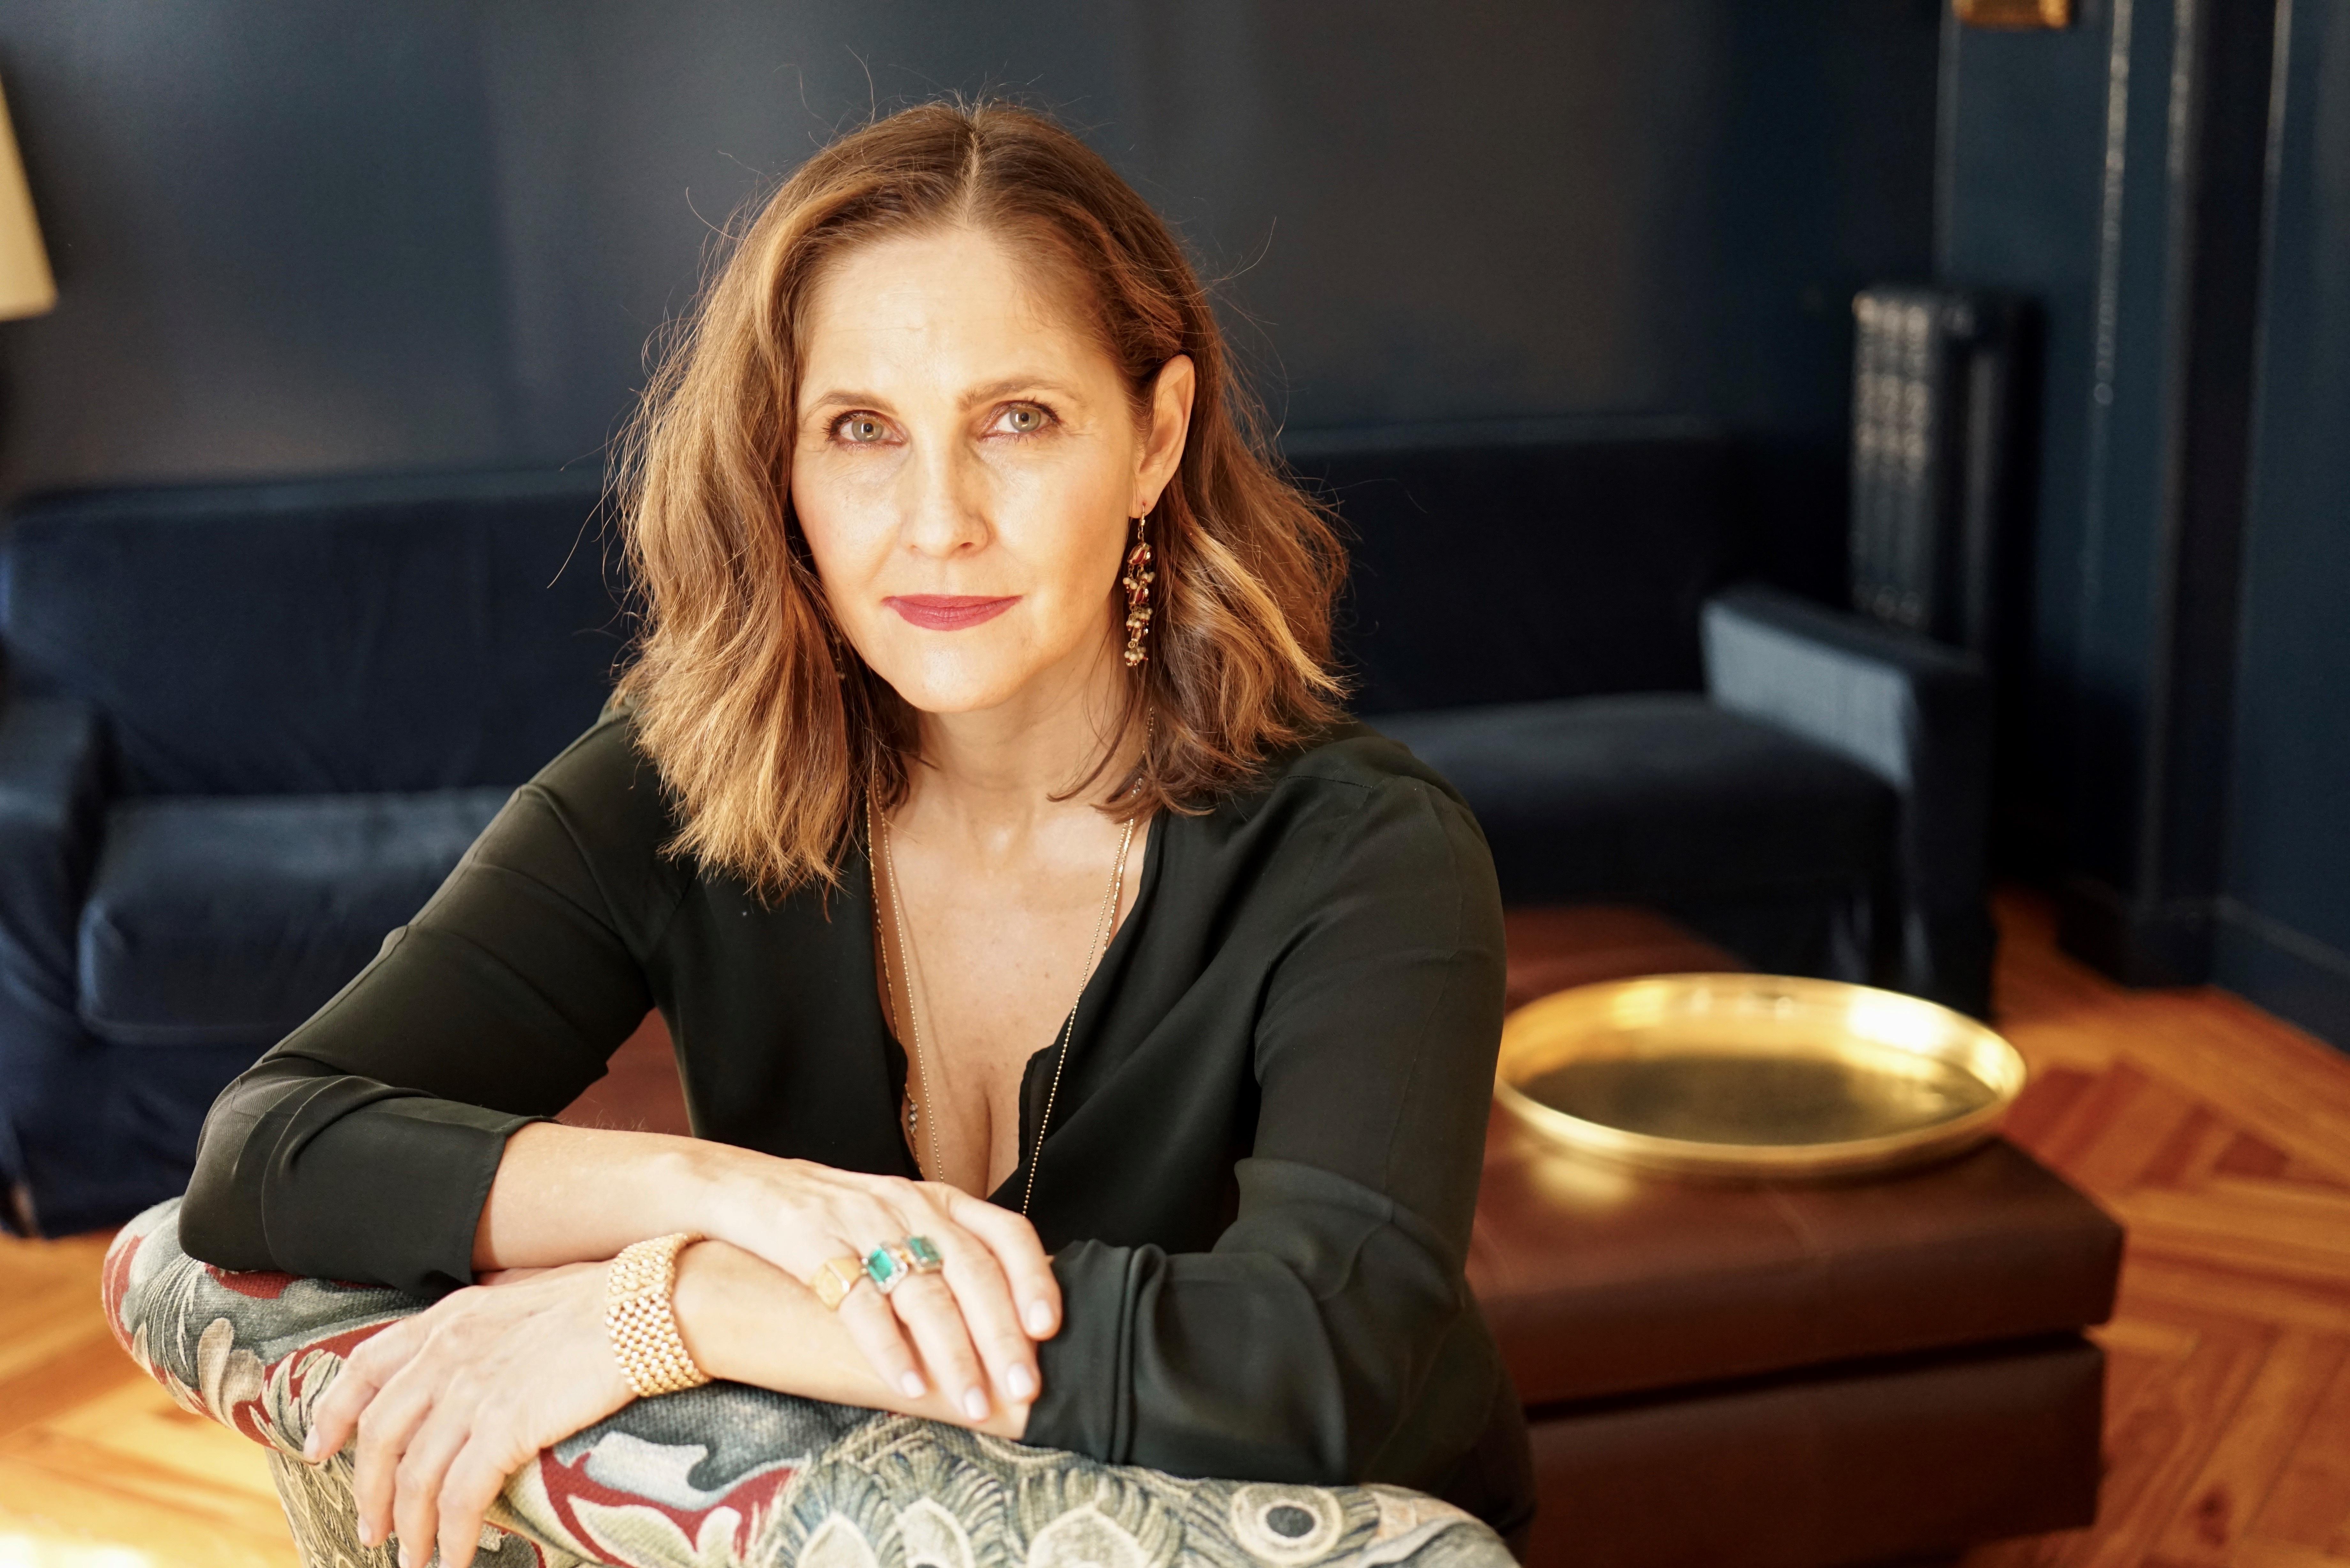 Sylvia Melian is co-founder of Melian-Randolph a sucessful interior design studio based in Madrid